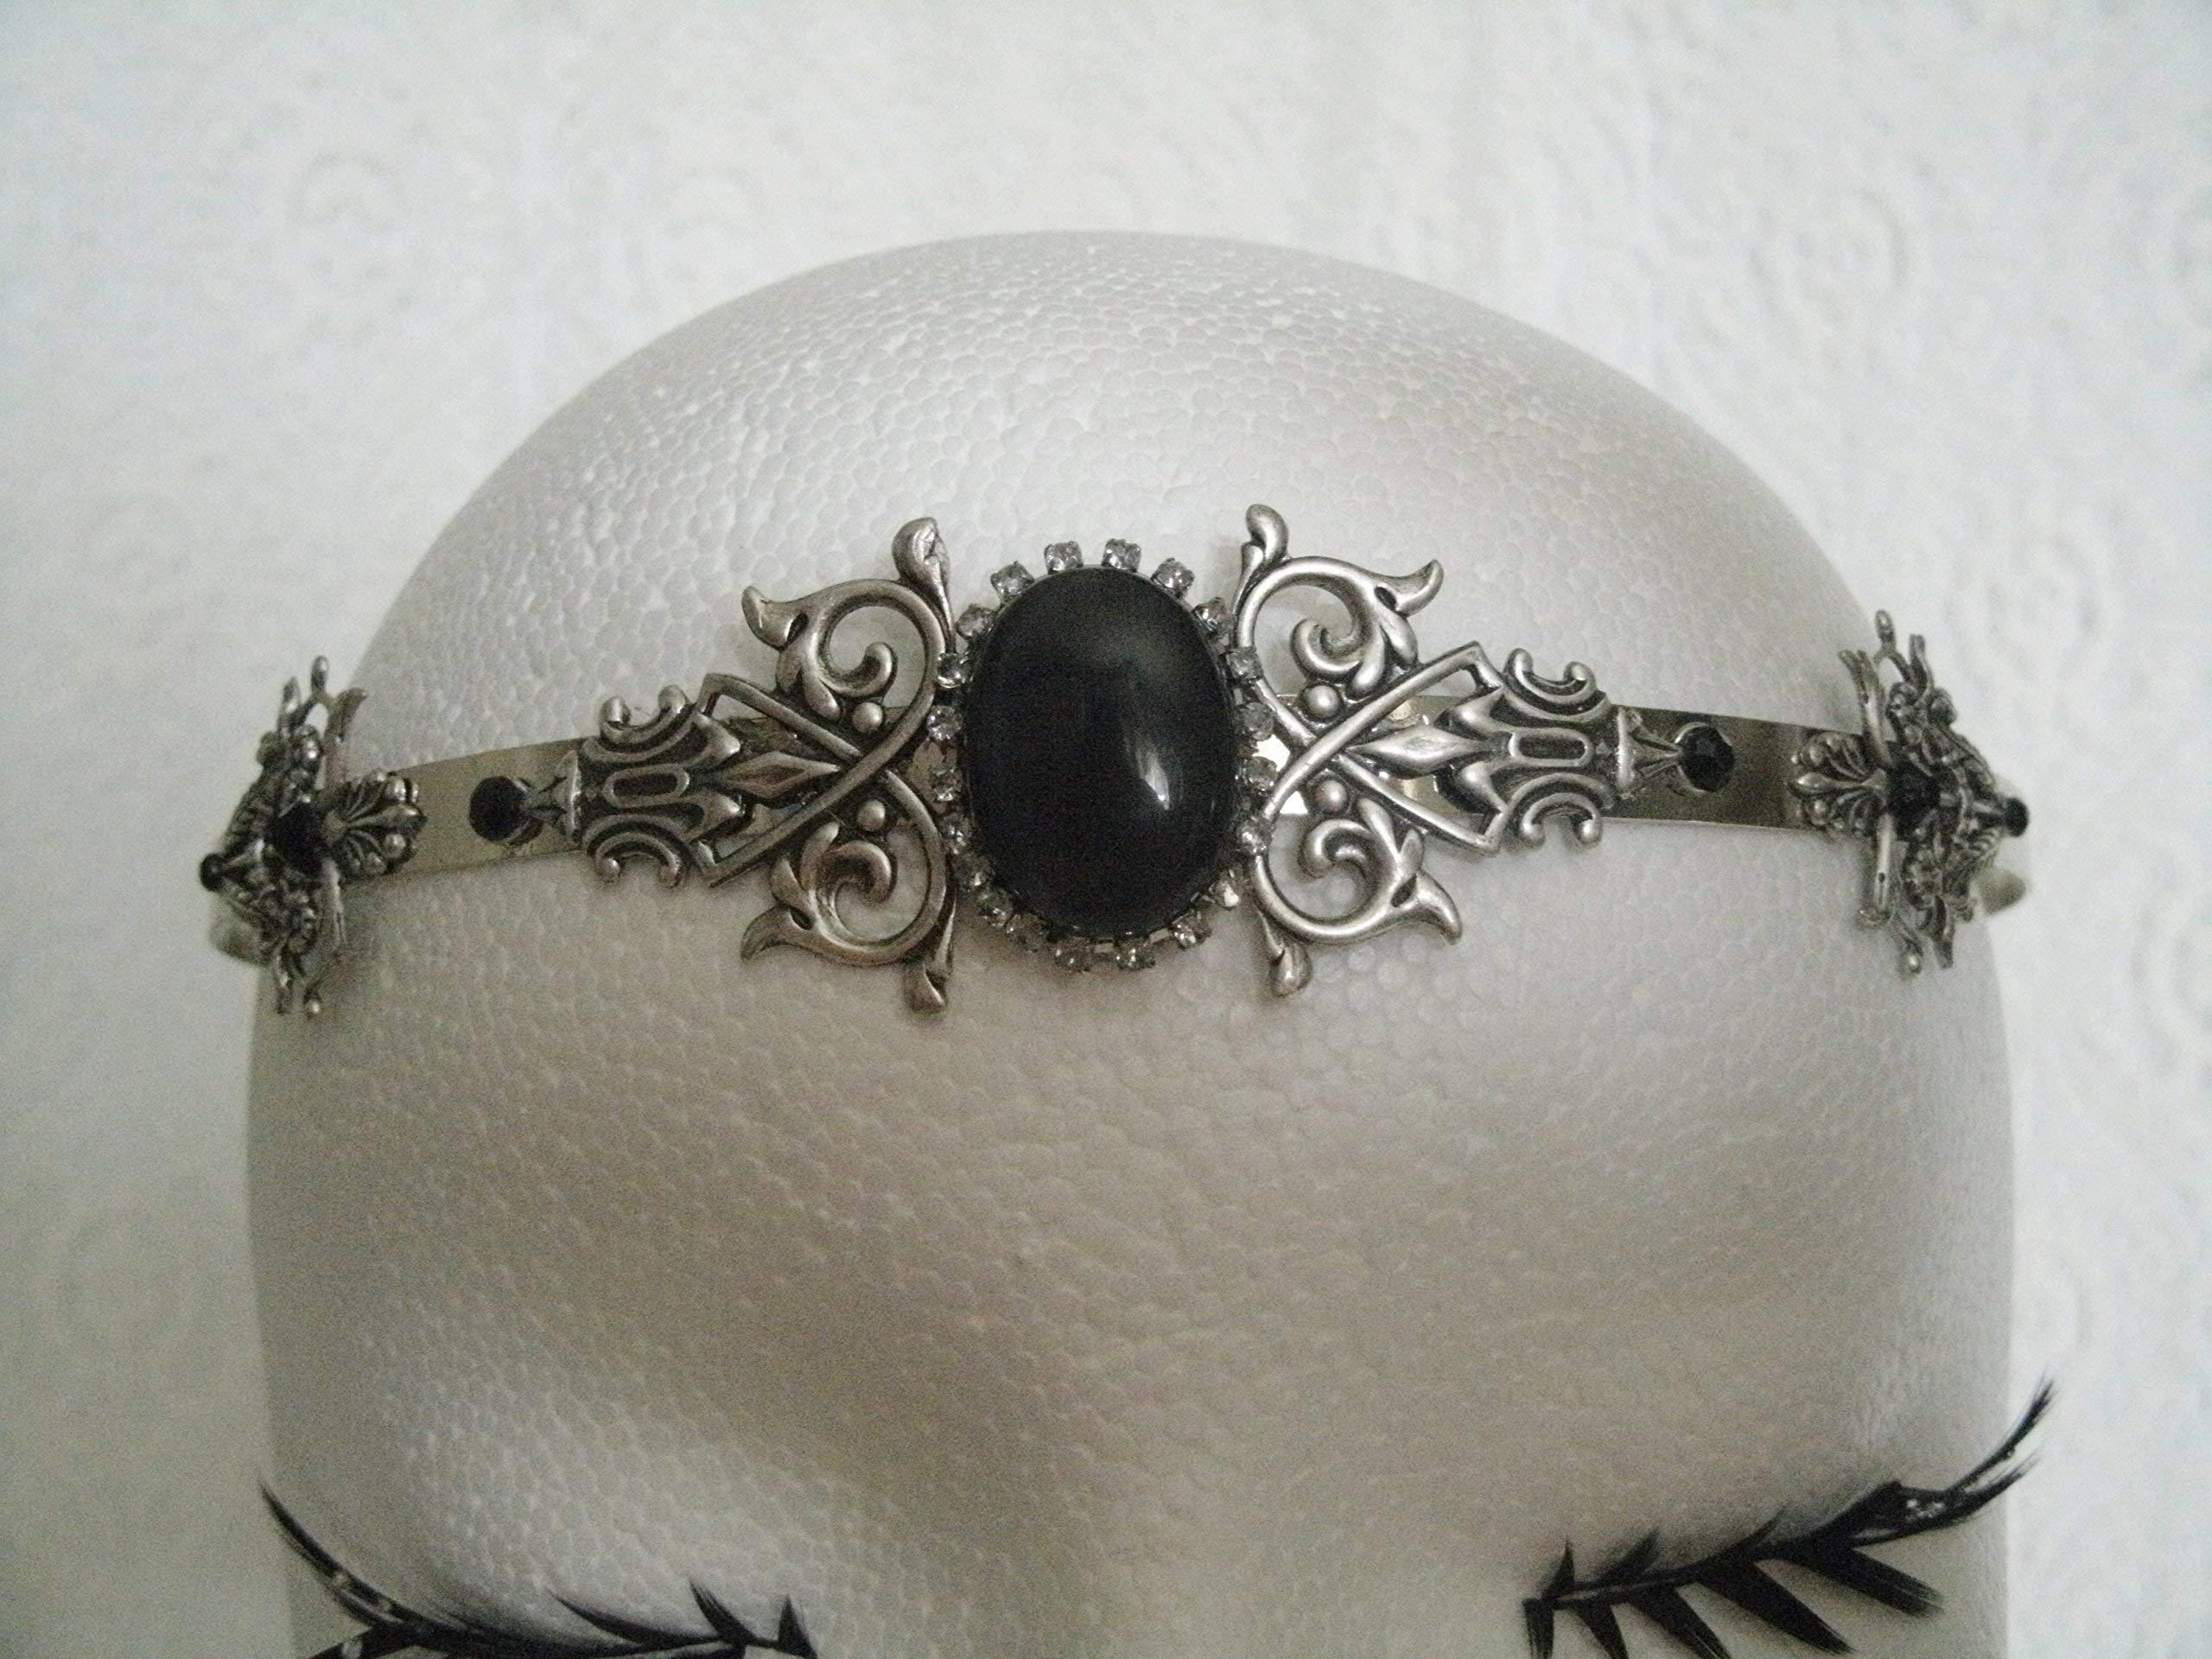 Gothic Circlet, handmade jewelry renaissance medieval victorian art nouveau art deco tudor headpiece tiara crown